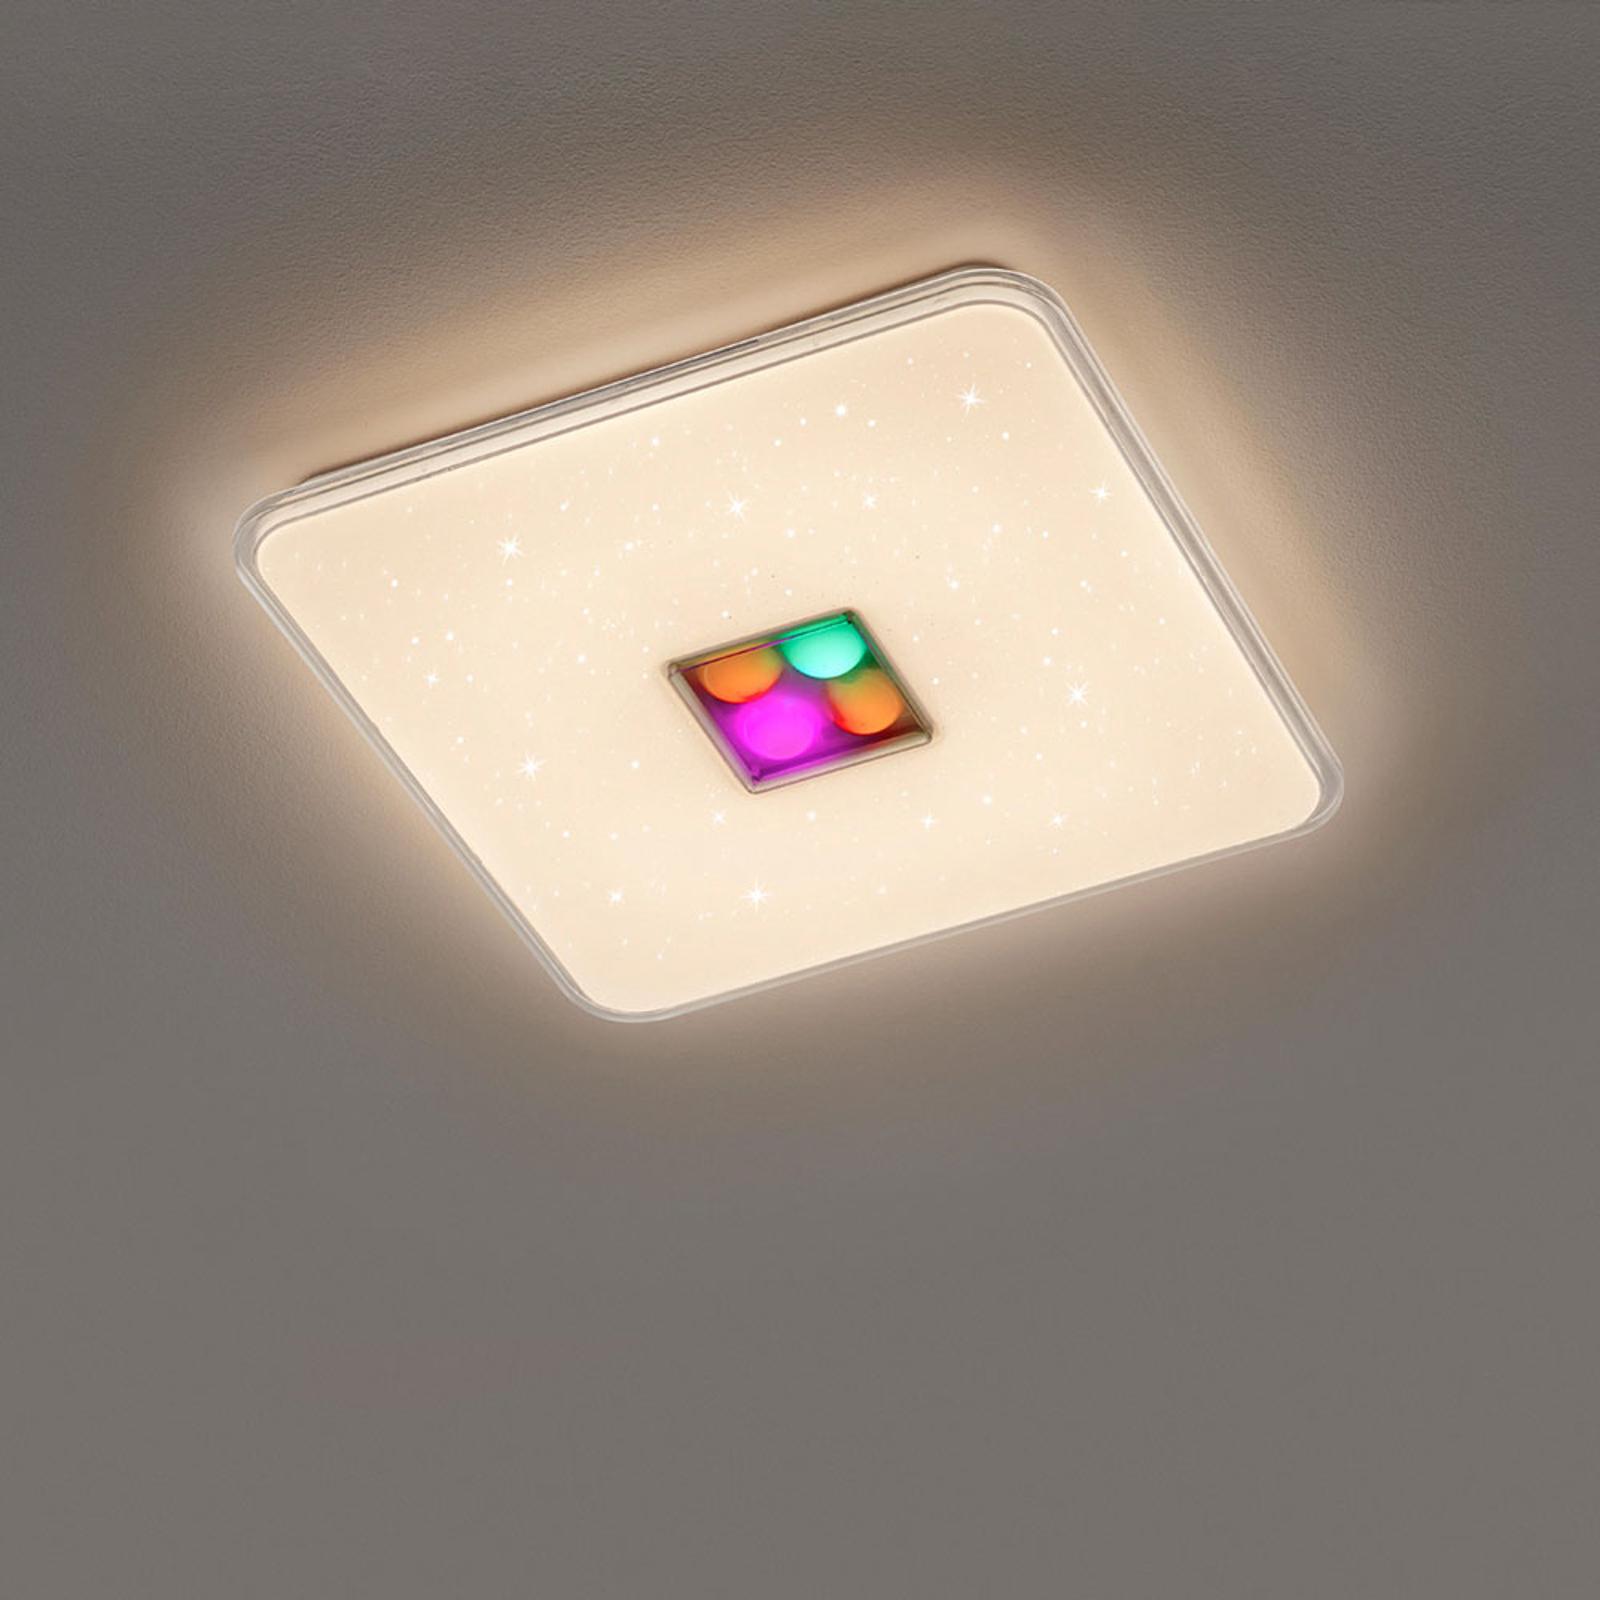 LED plafondlamp Ogasaki, RGBW, afstandsb., 42cm